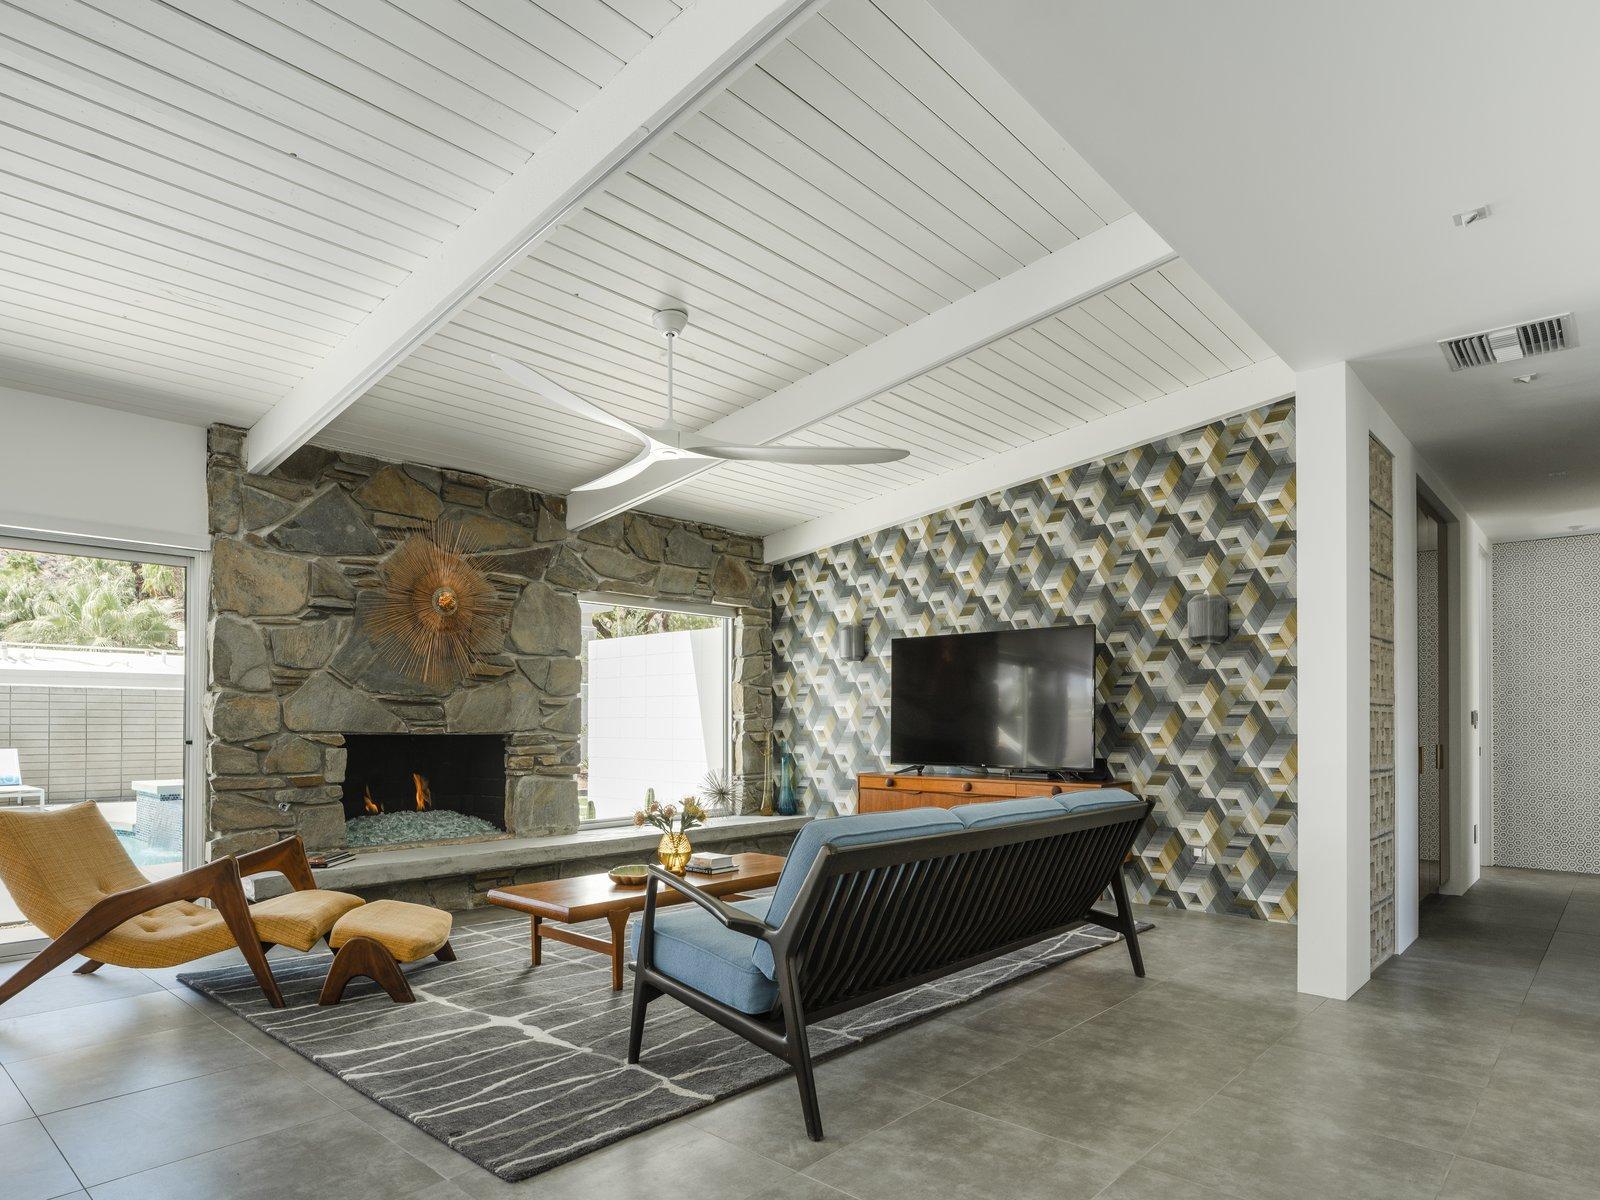 Midcentury Alexander living room